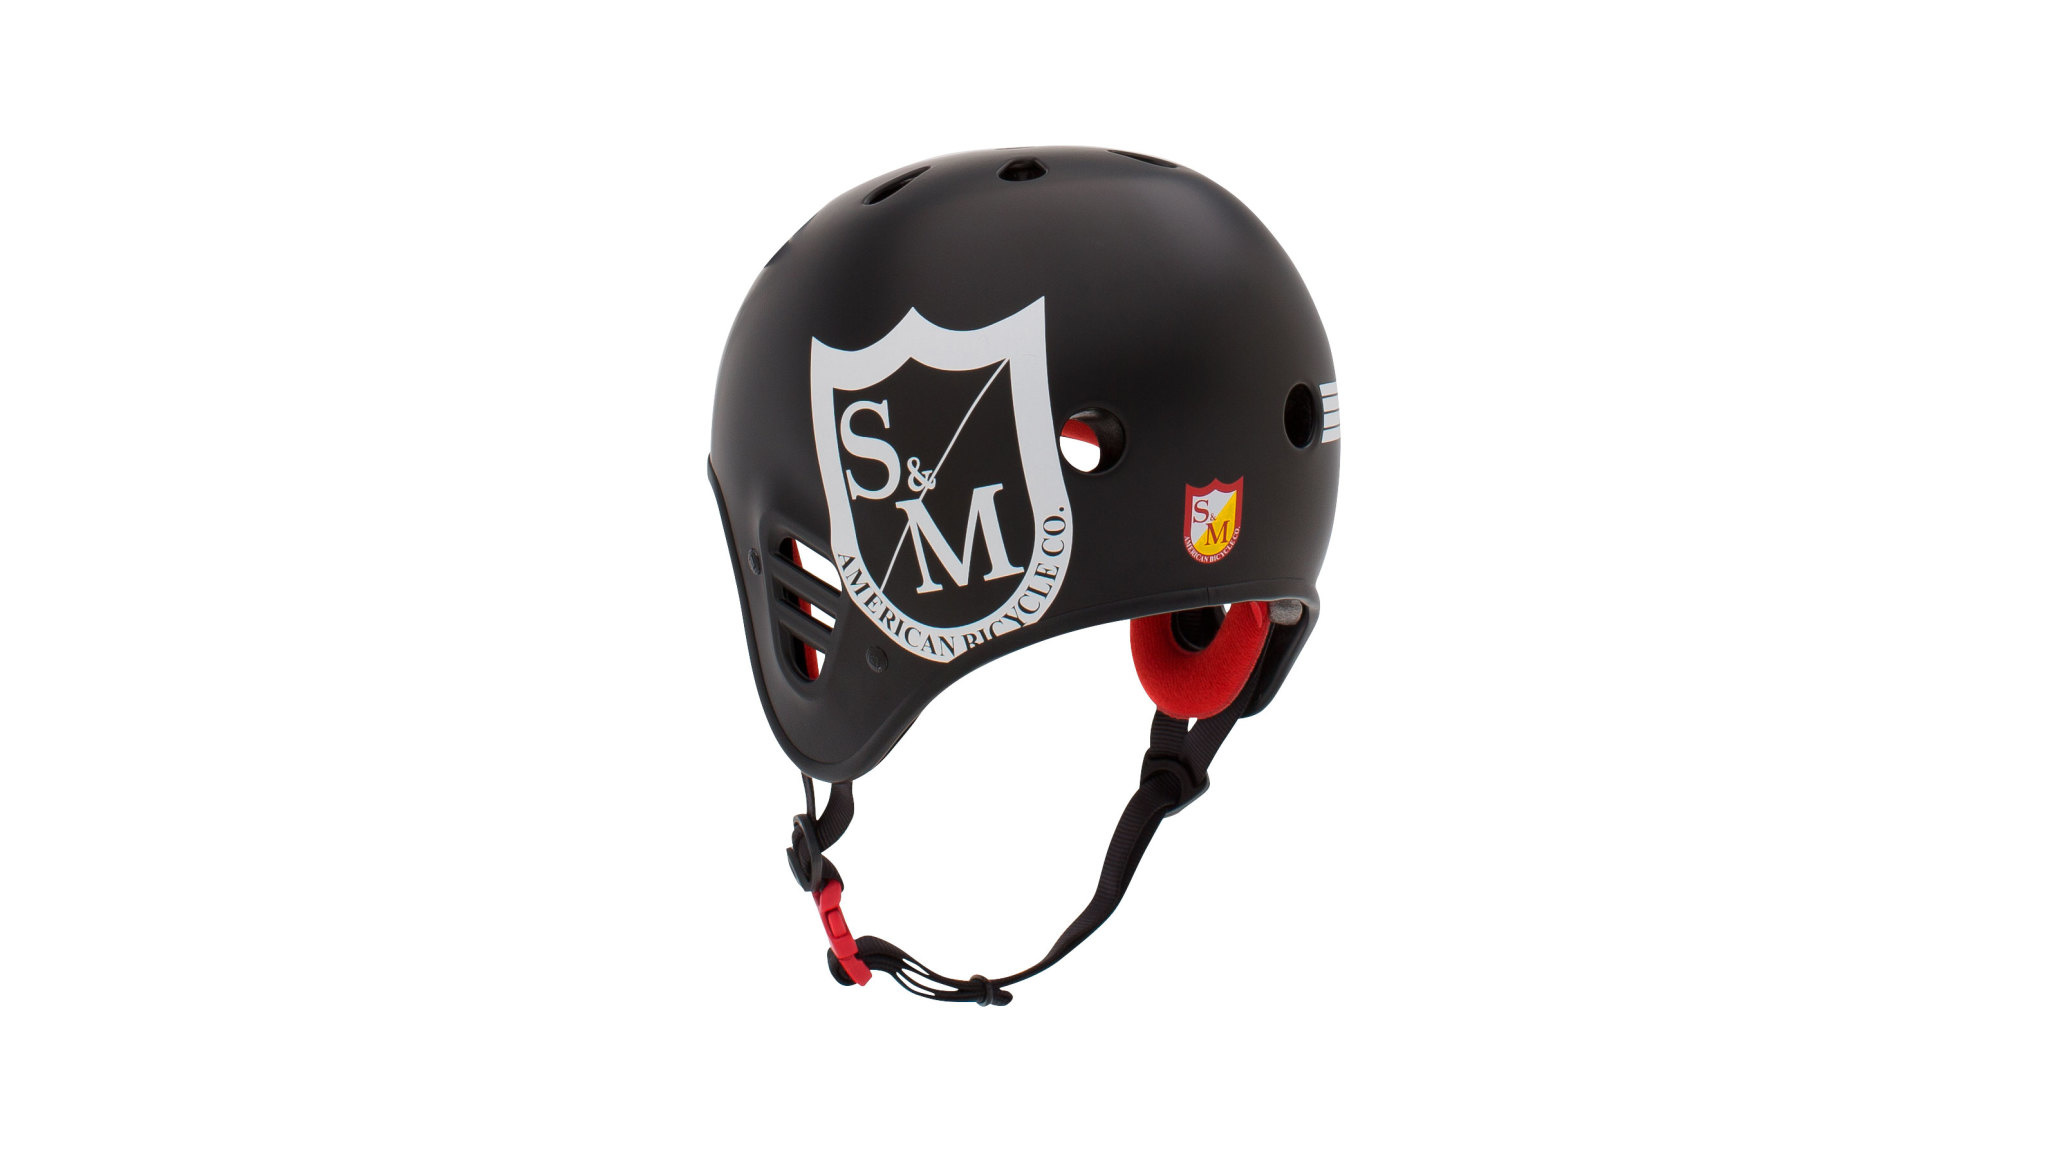 Pro-Tec S&M Fullcut (Certified) Matte Black Helmet